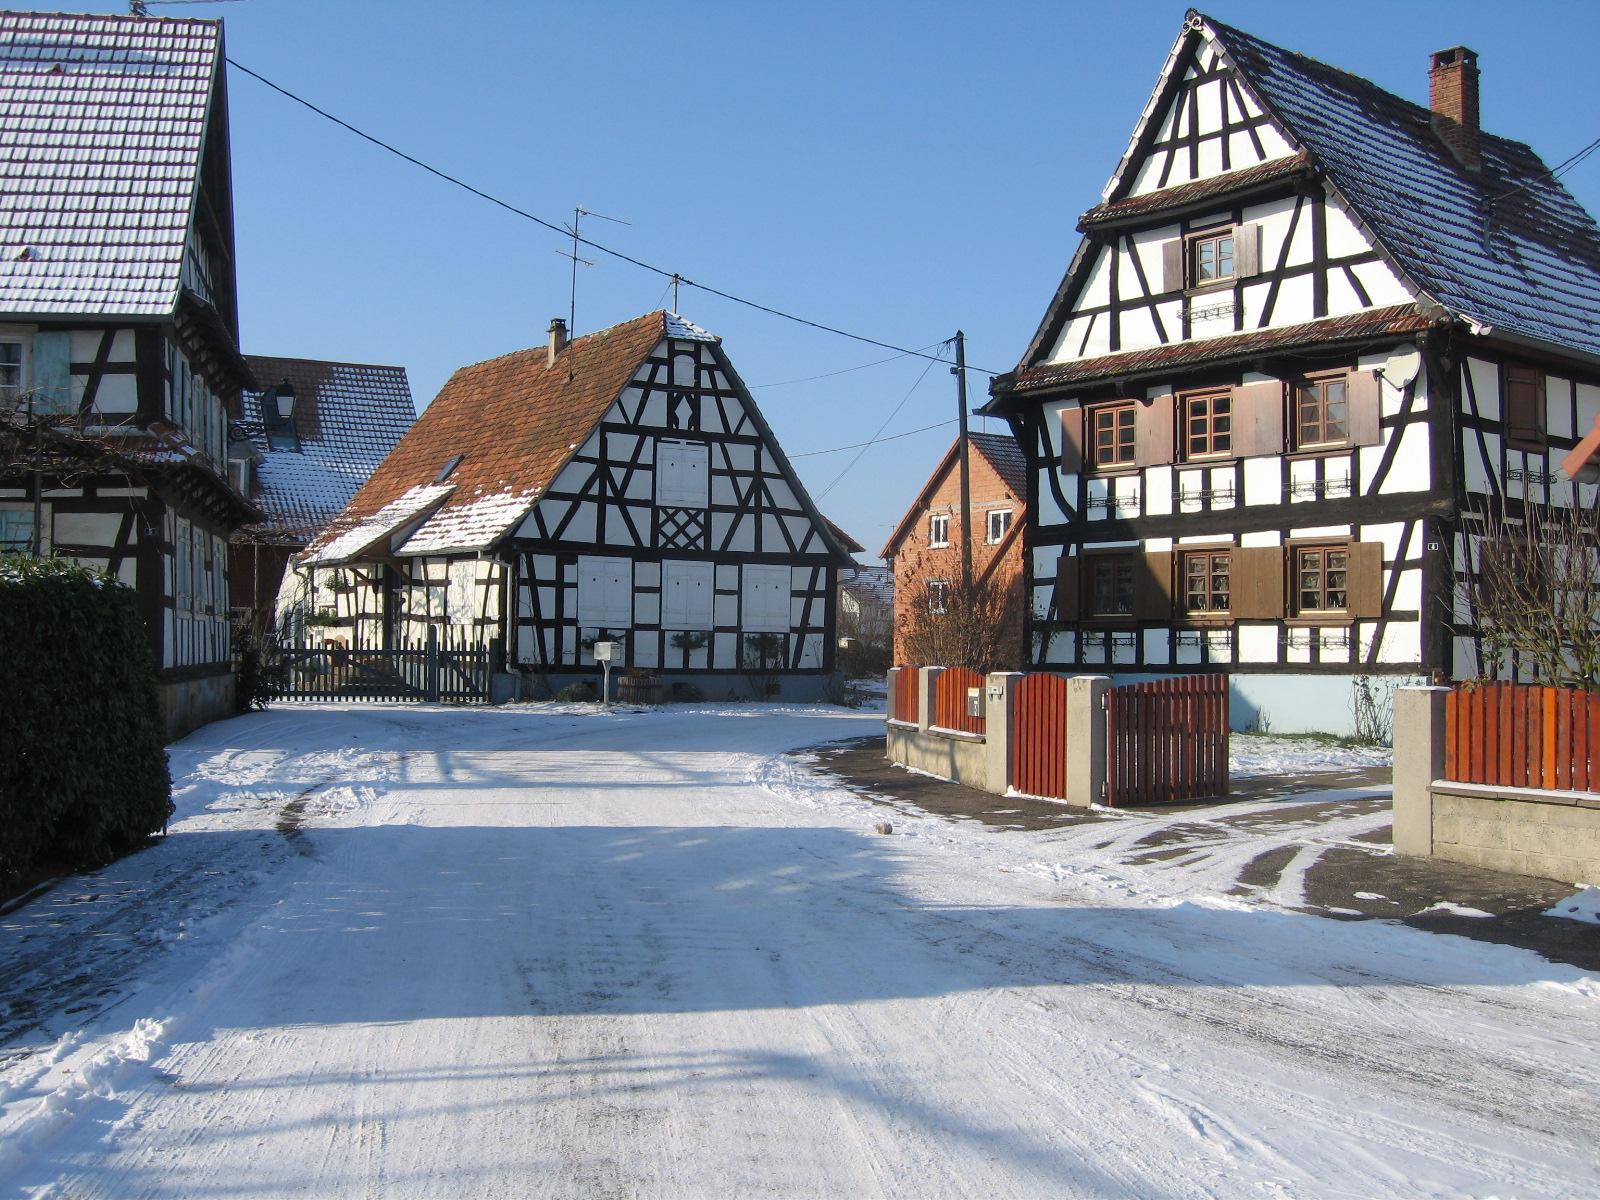 rue sous la neige